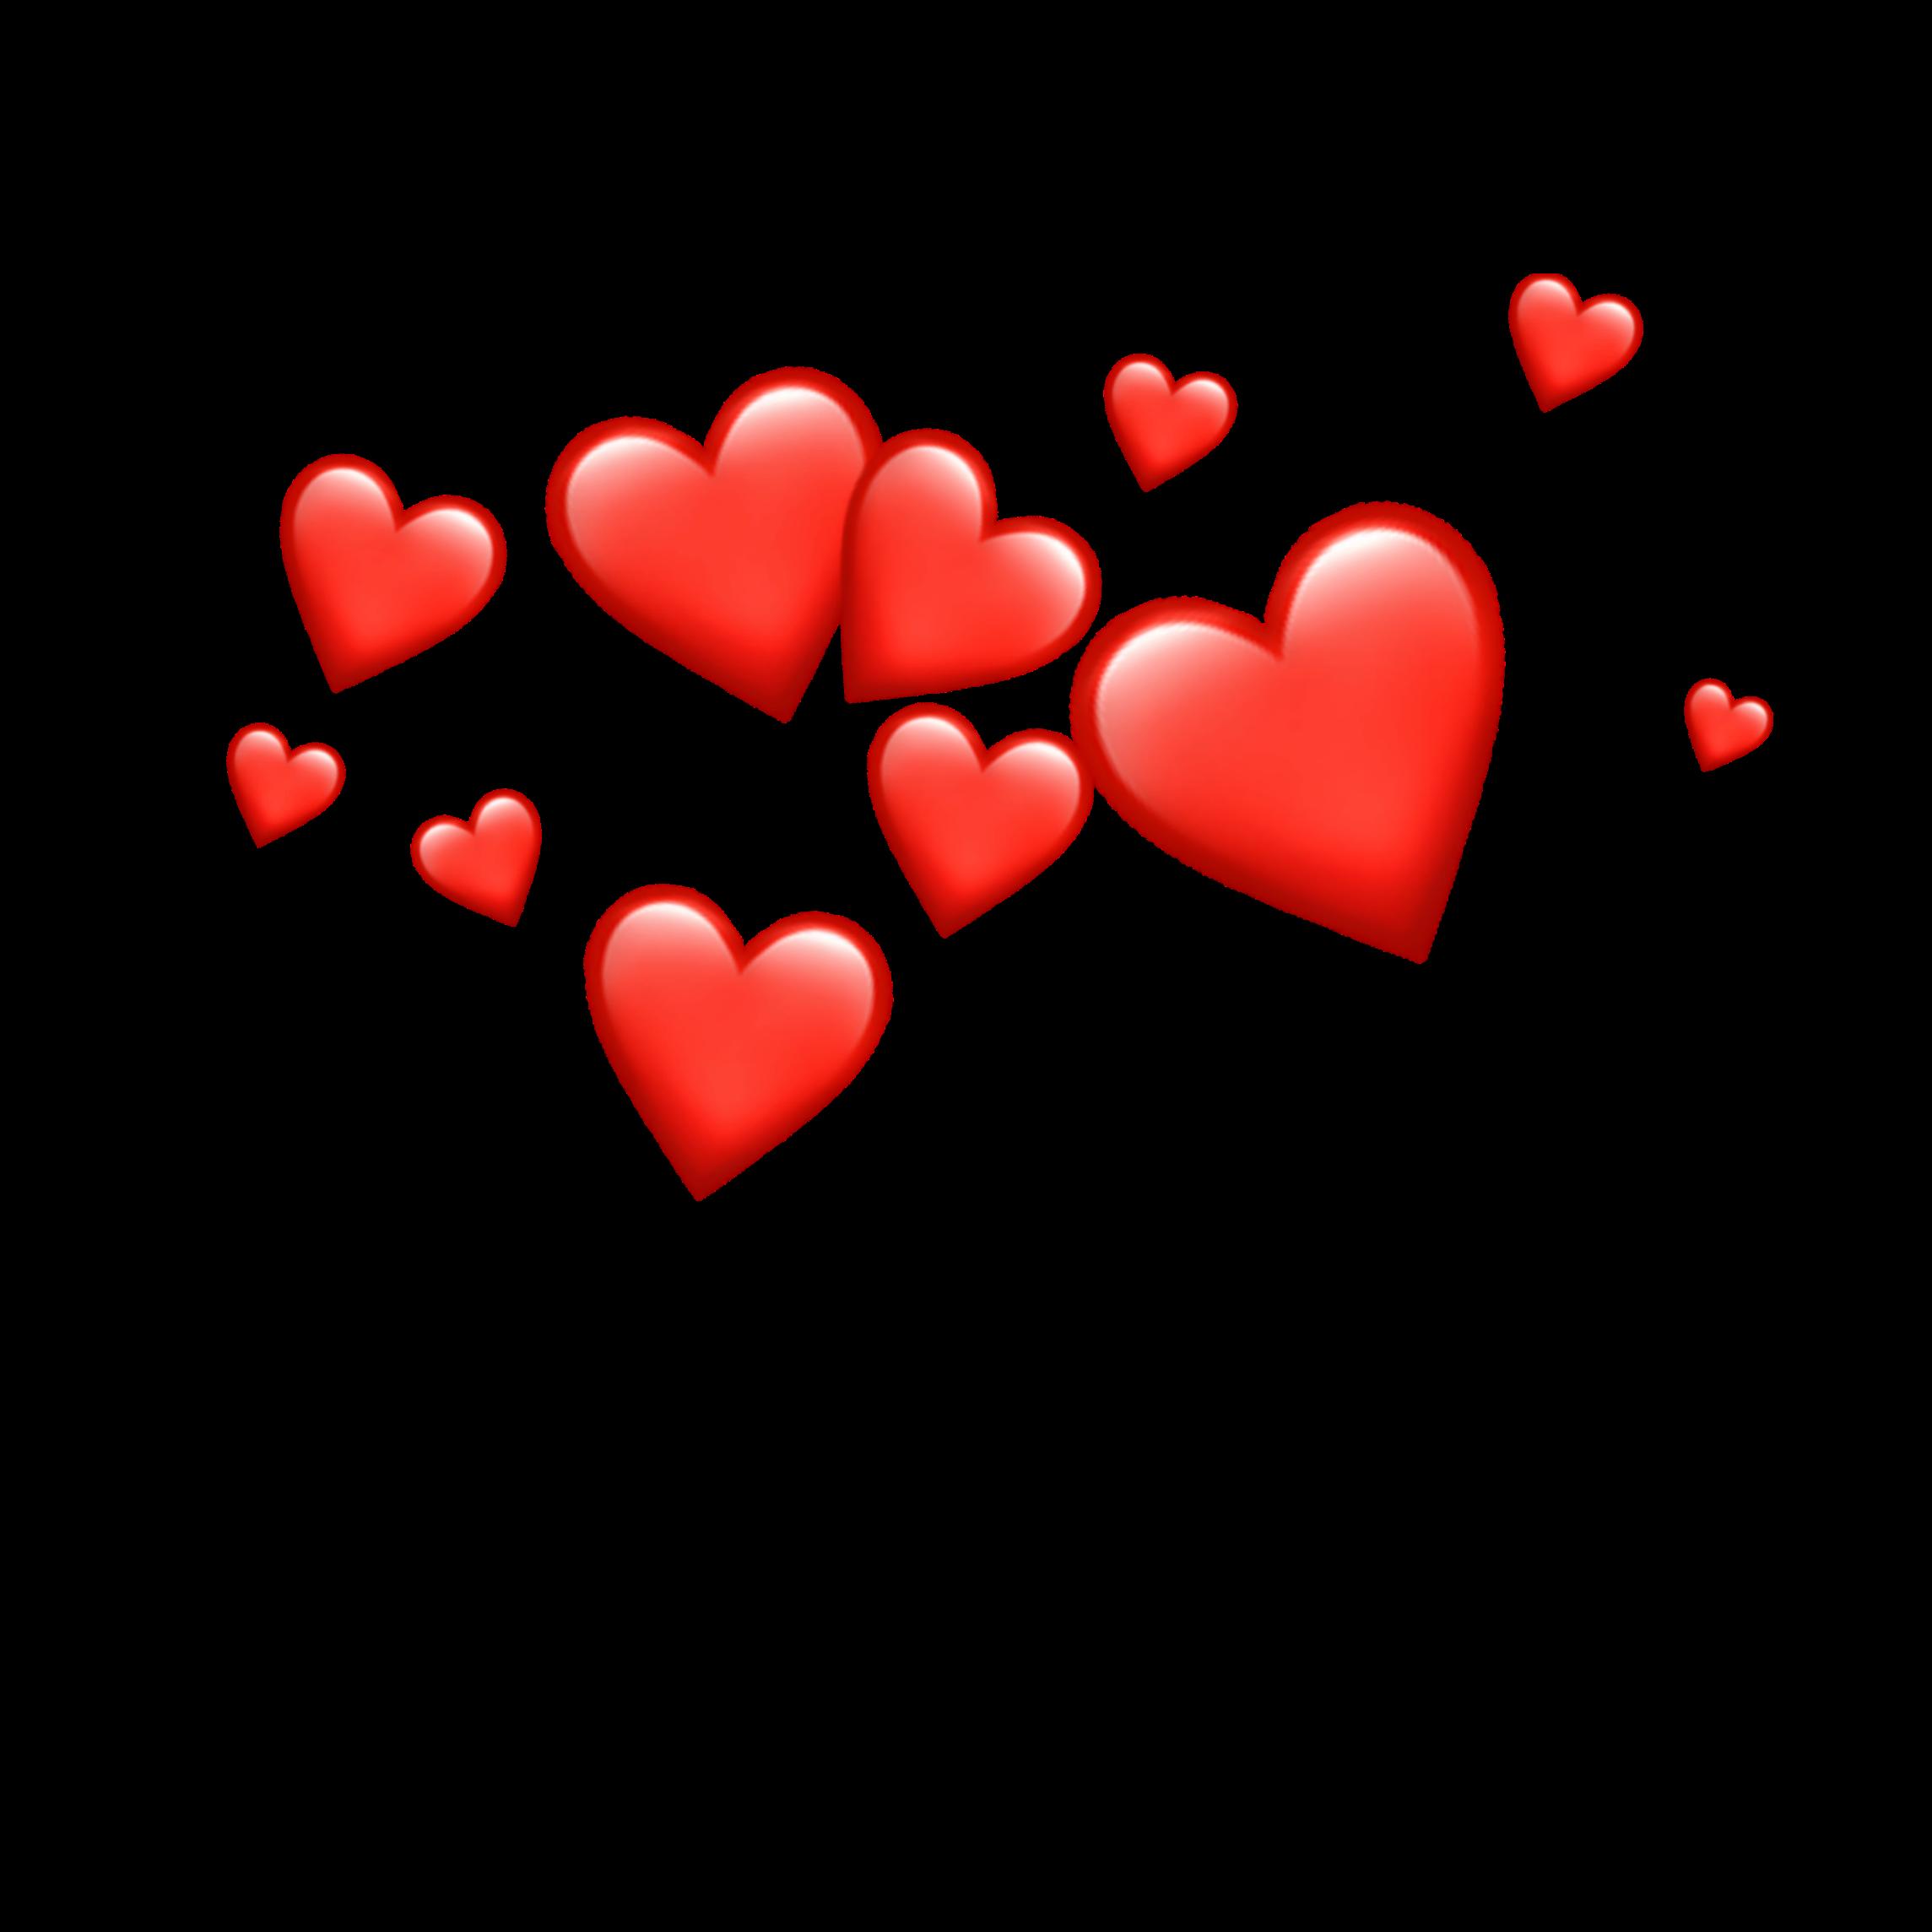 Heart Hearts Emoji Emojis Tumblr Red Freetoedit Heart Emoji Emoji Wallpaper